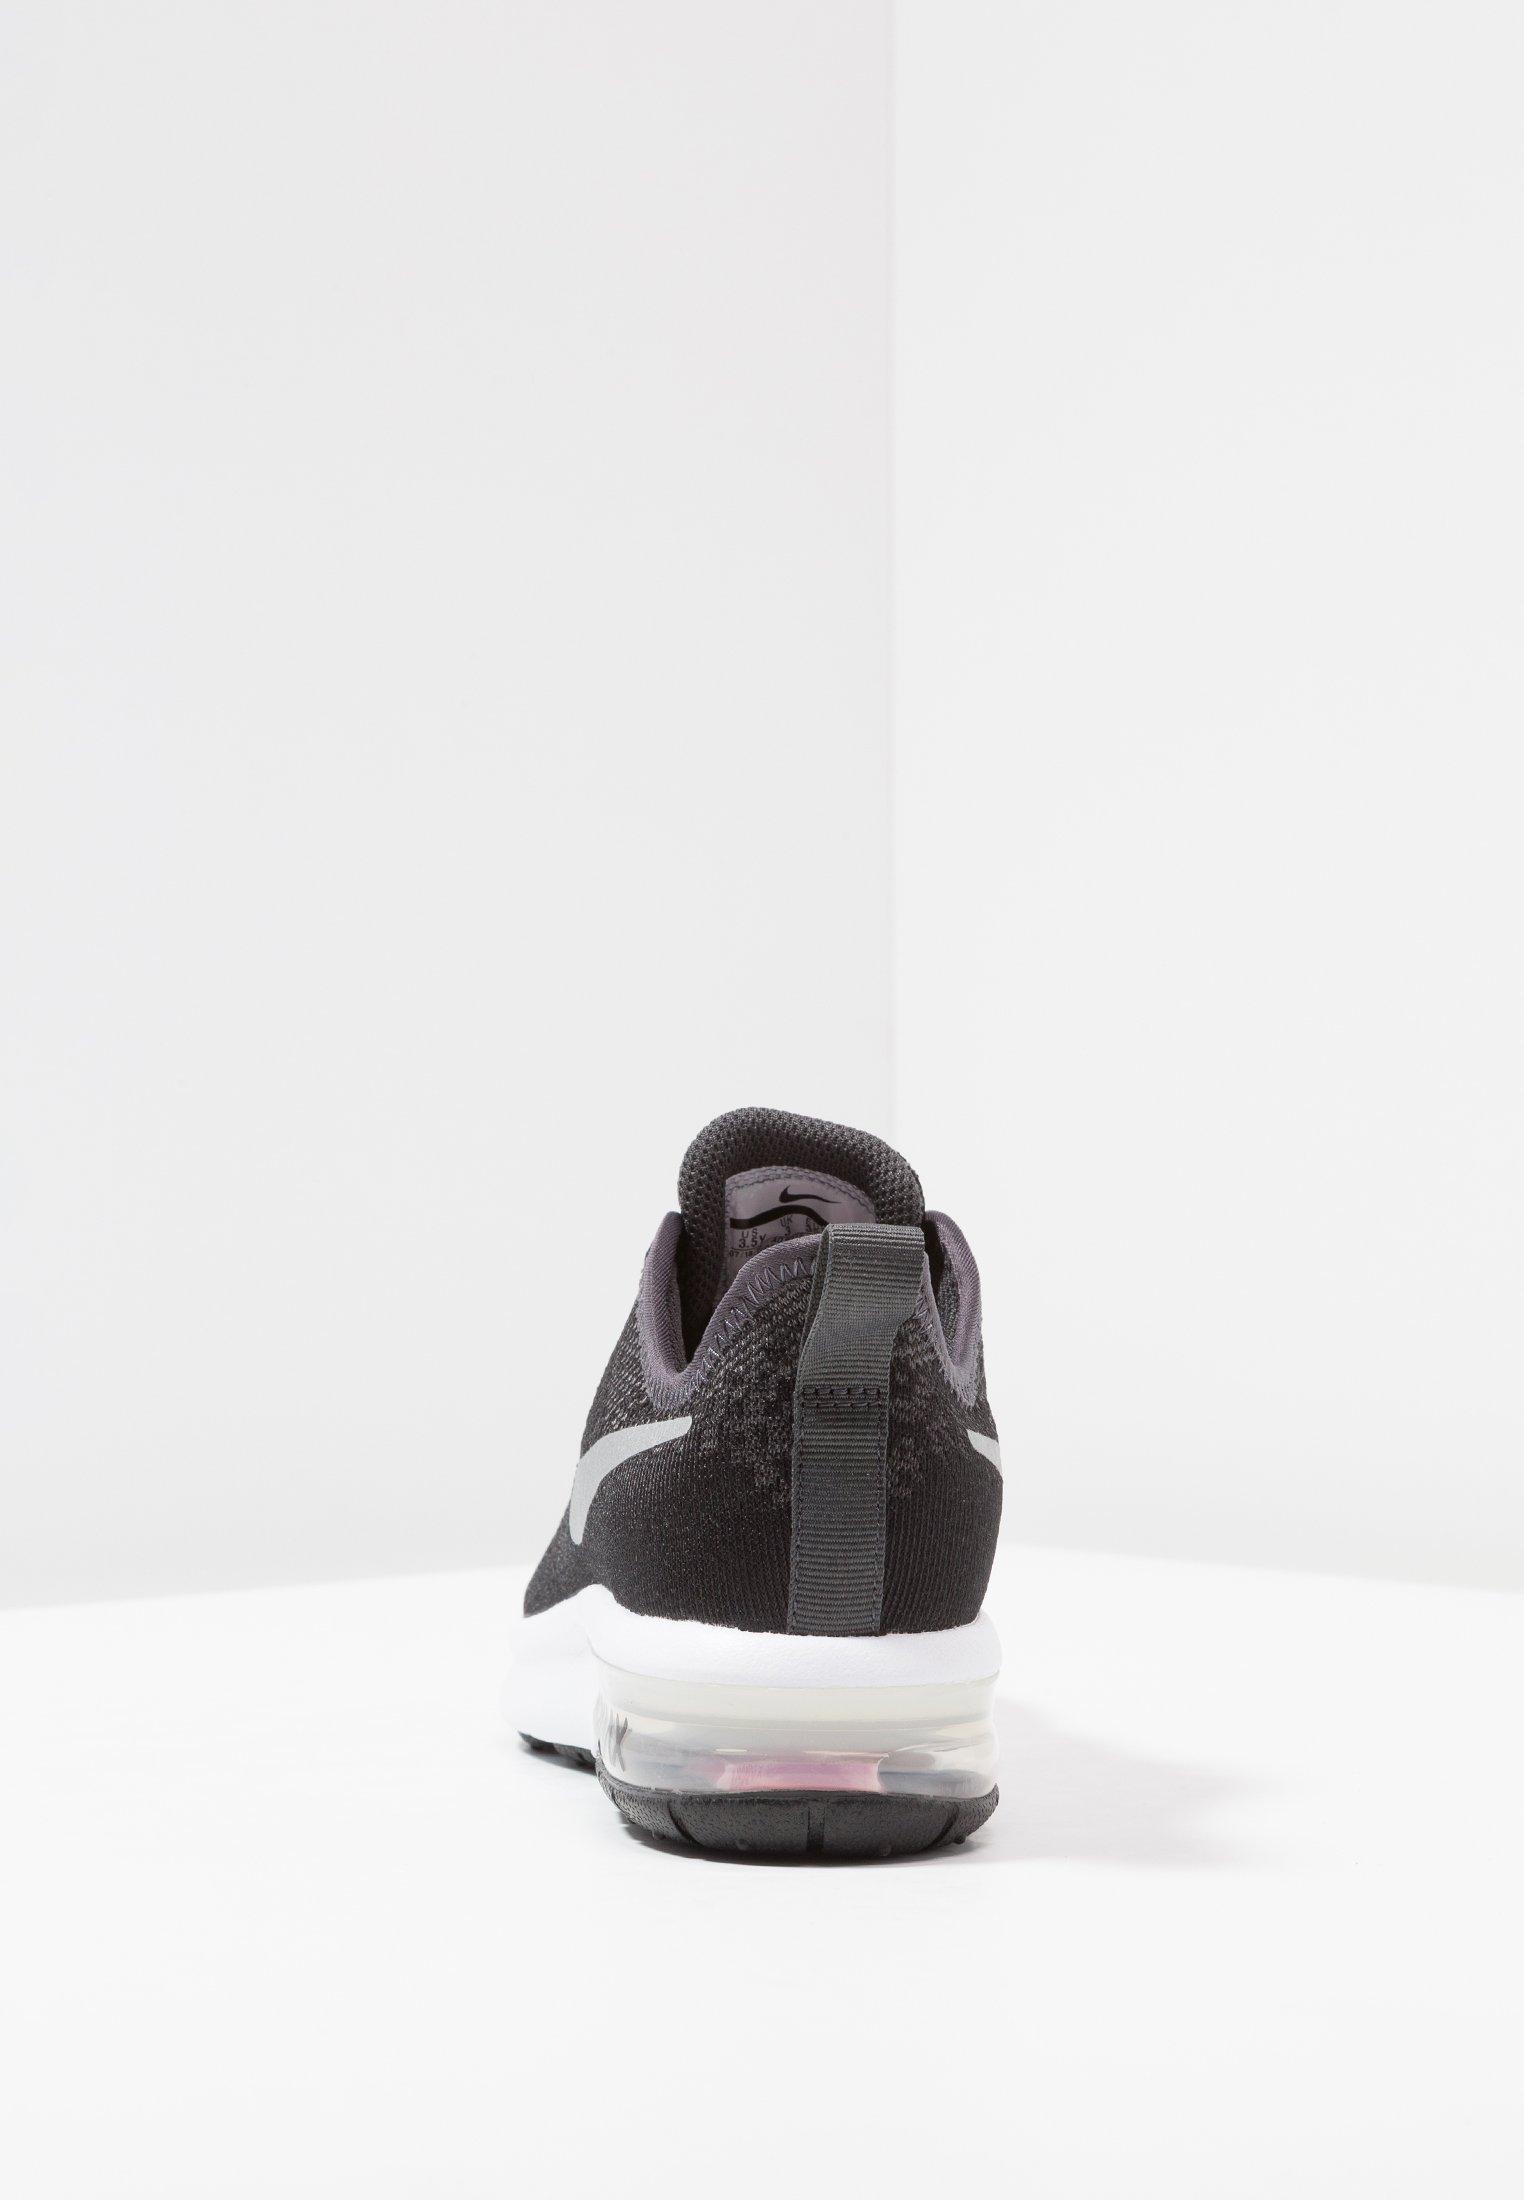 AIR MAX SEQUENT 4 Chaussures de running neutres blackmetallic silveranthracitewhite